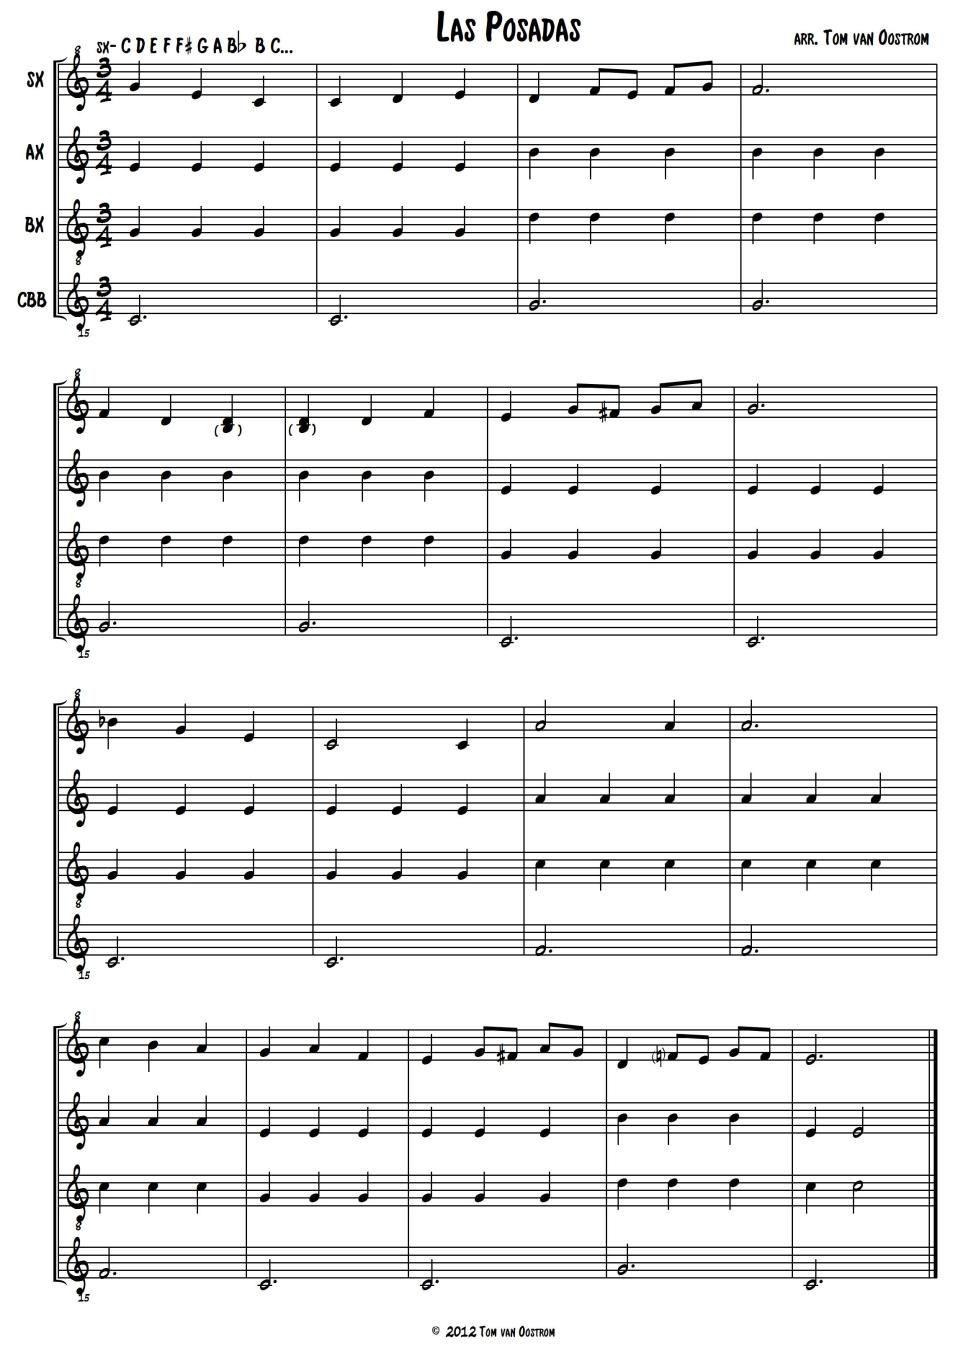 "Workbooks las posadas worksheets : Las Posadas"" Orff Arrangement | Clase de musica, Flauta y Musica"